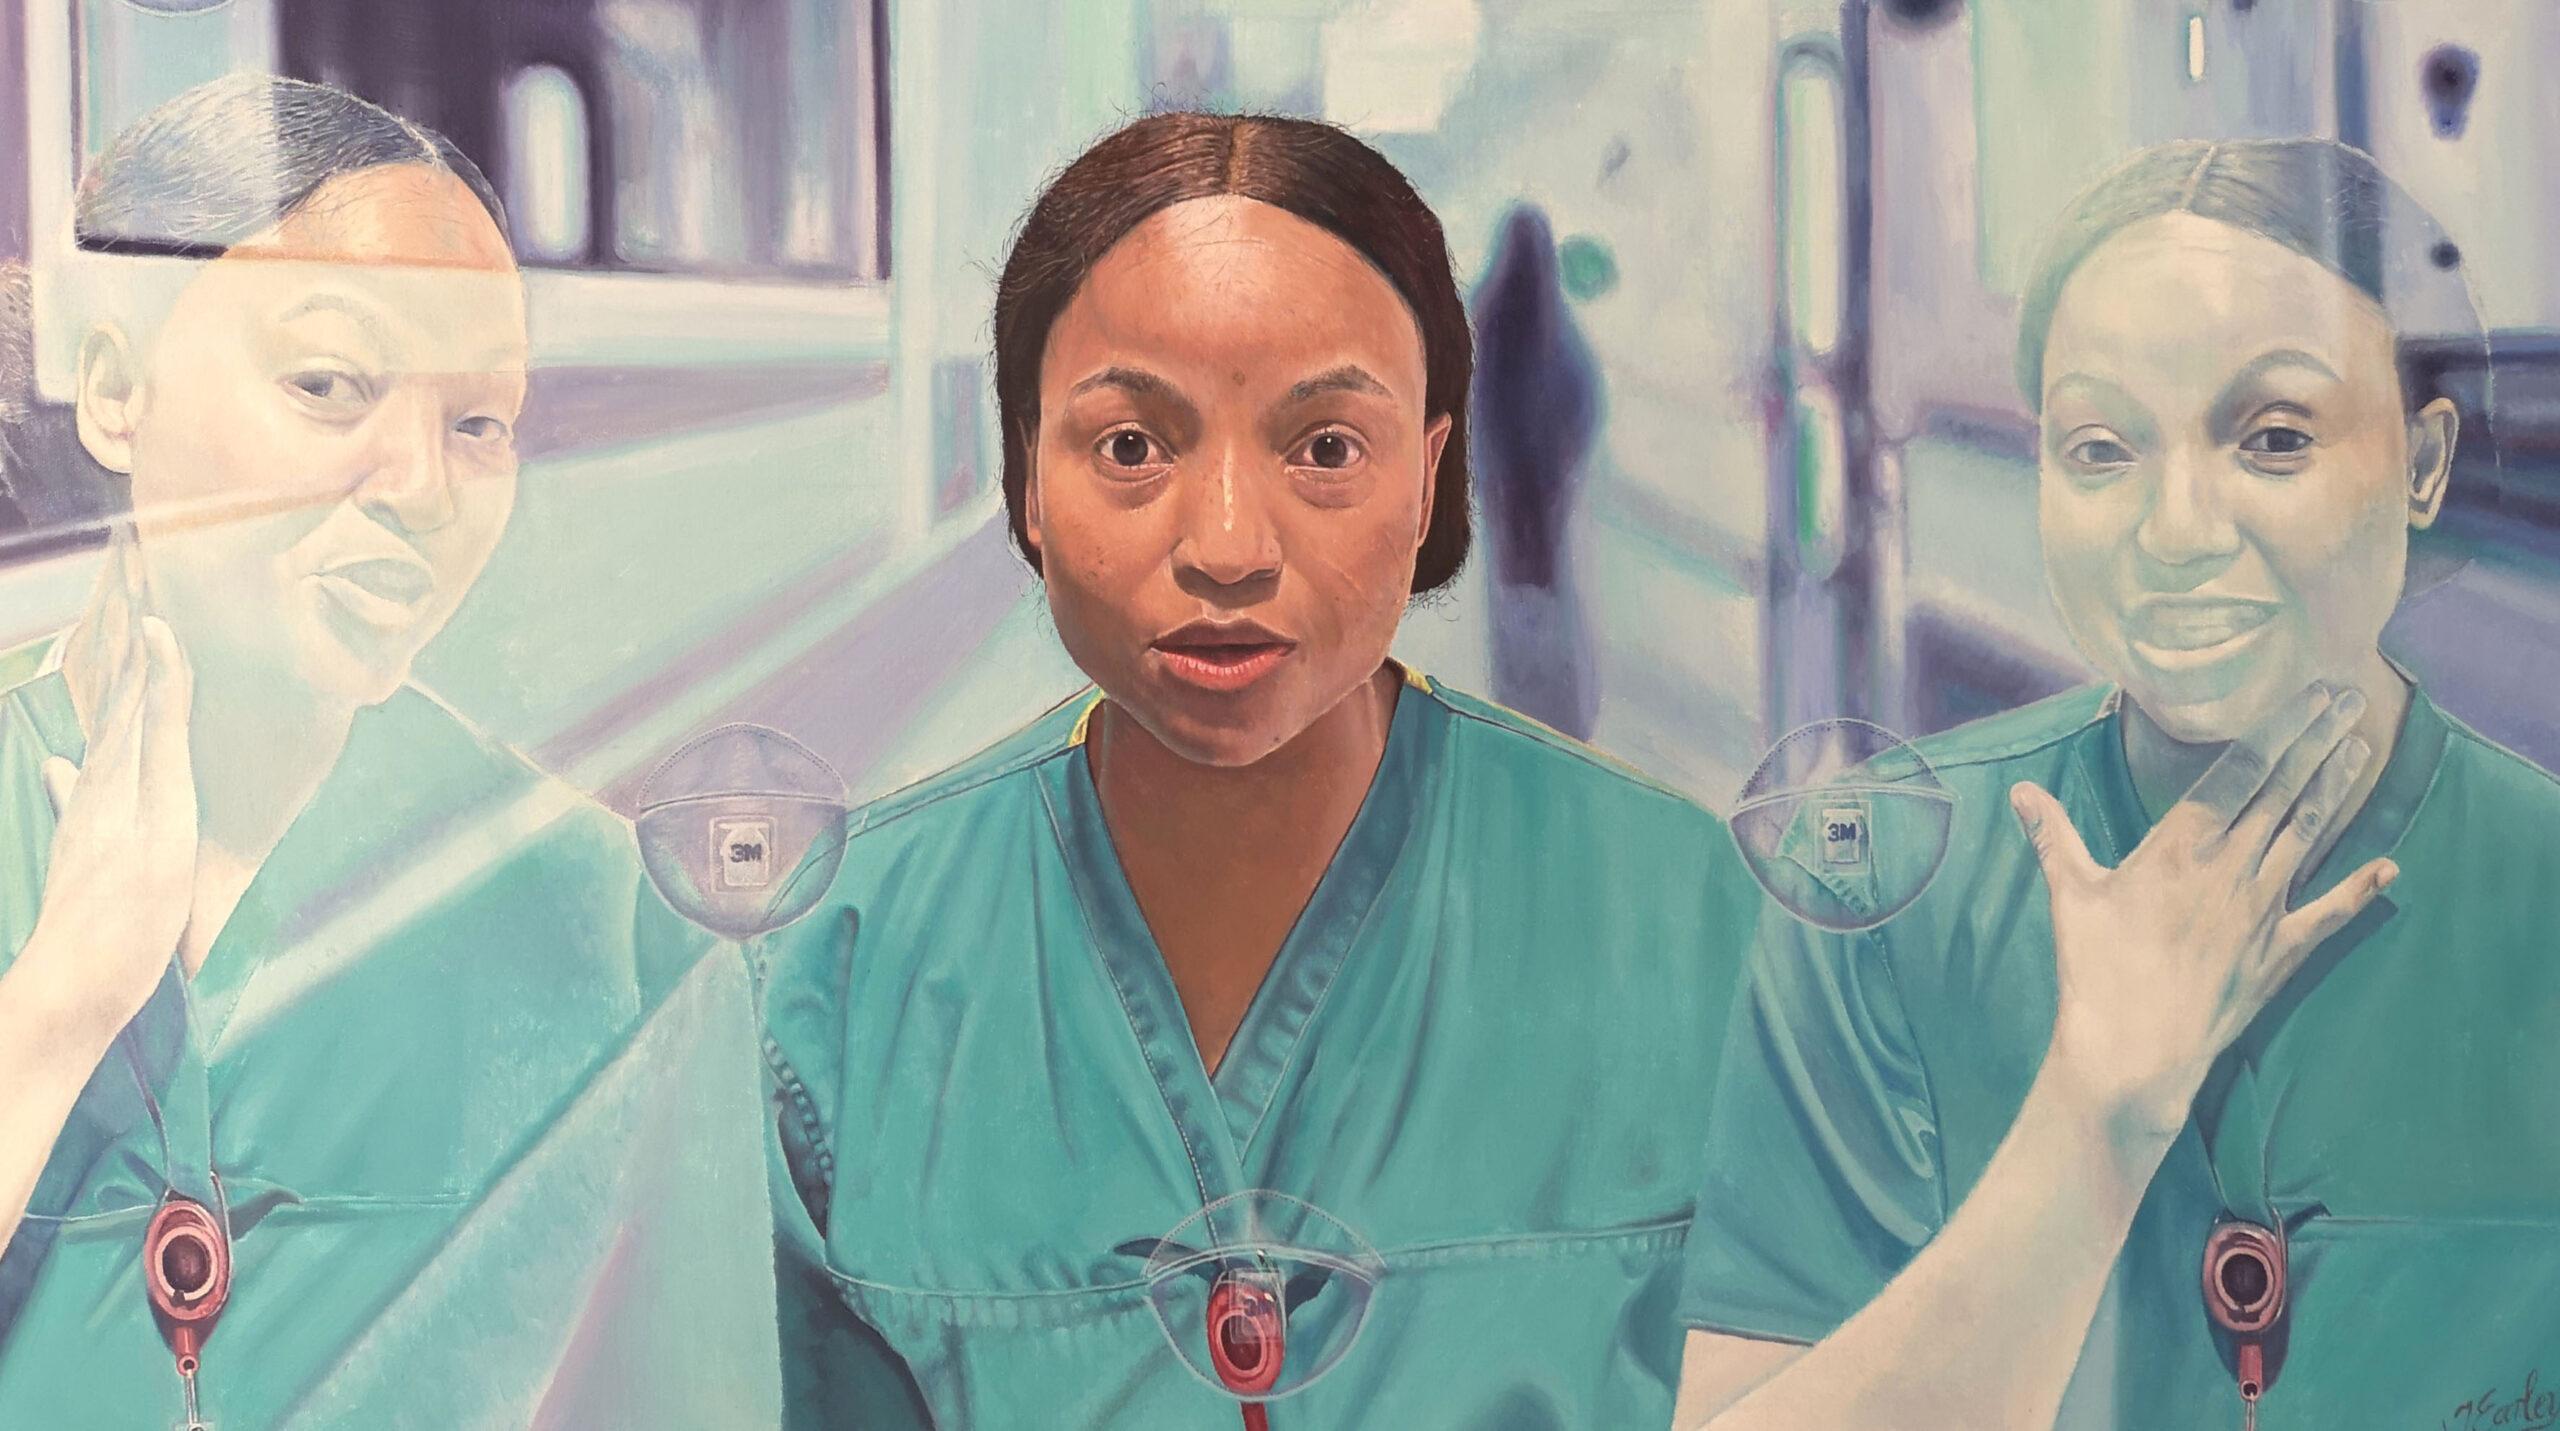 Susan Portrait by James Earley